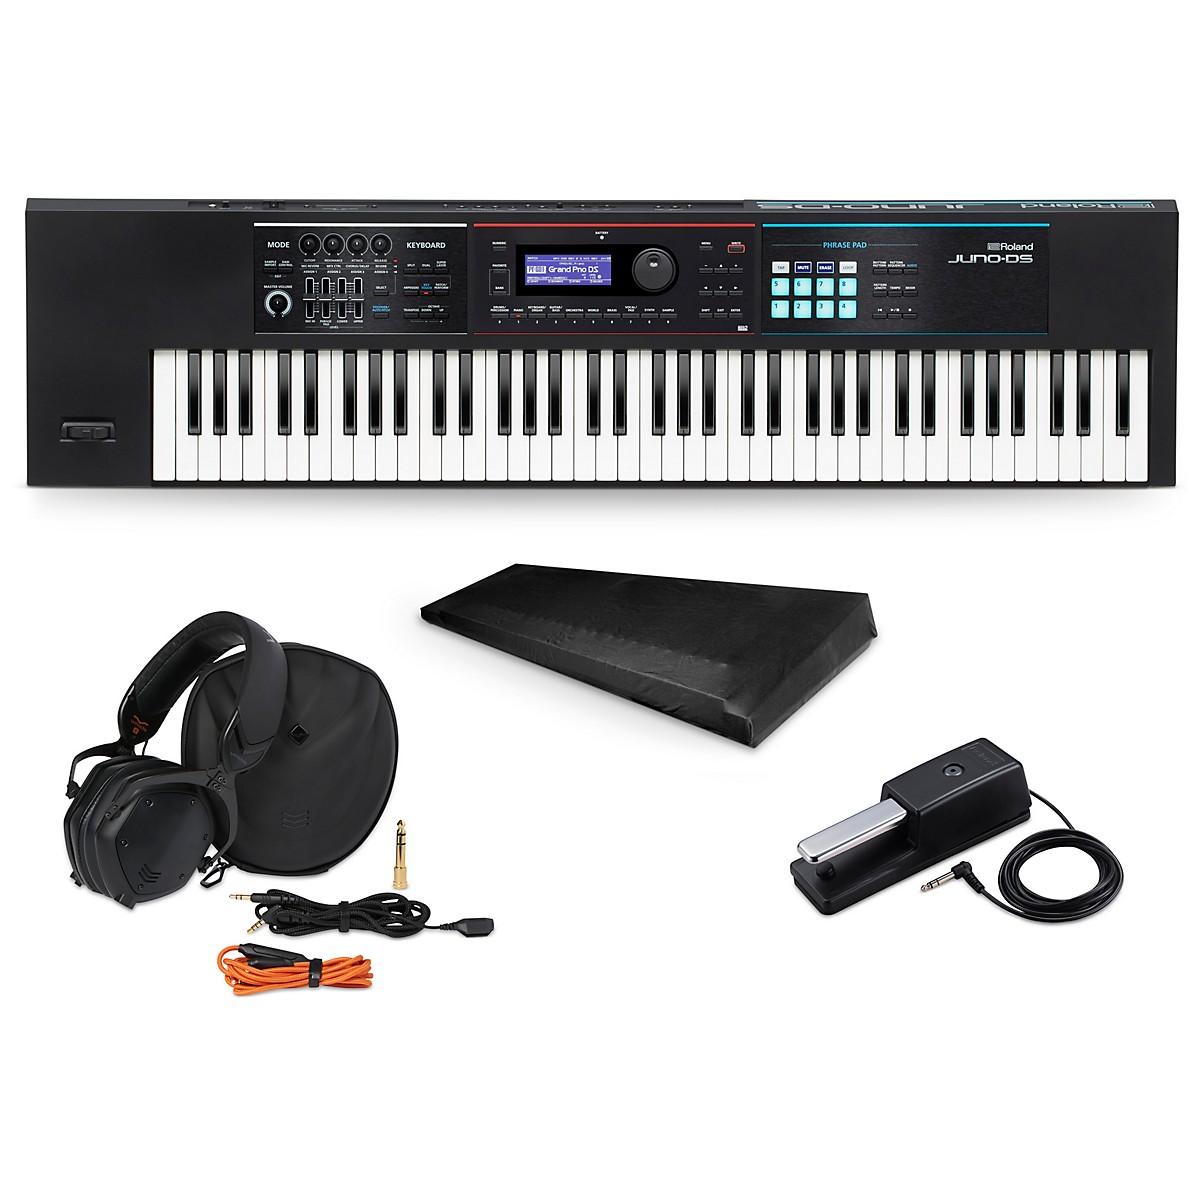 Roland JUNO-DS76 Synthesizer Essentials Package